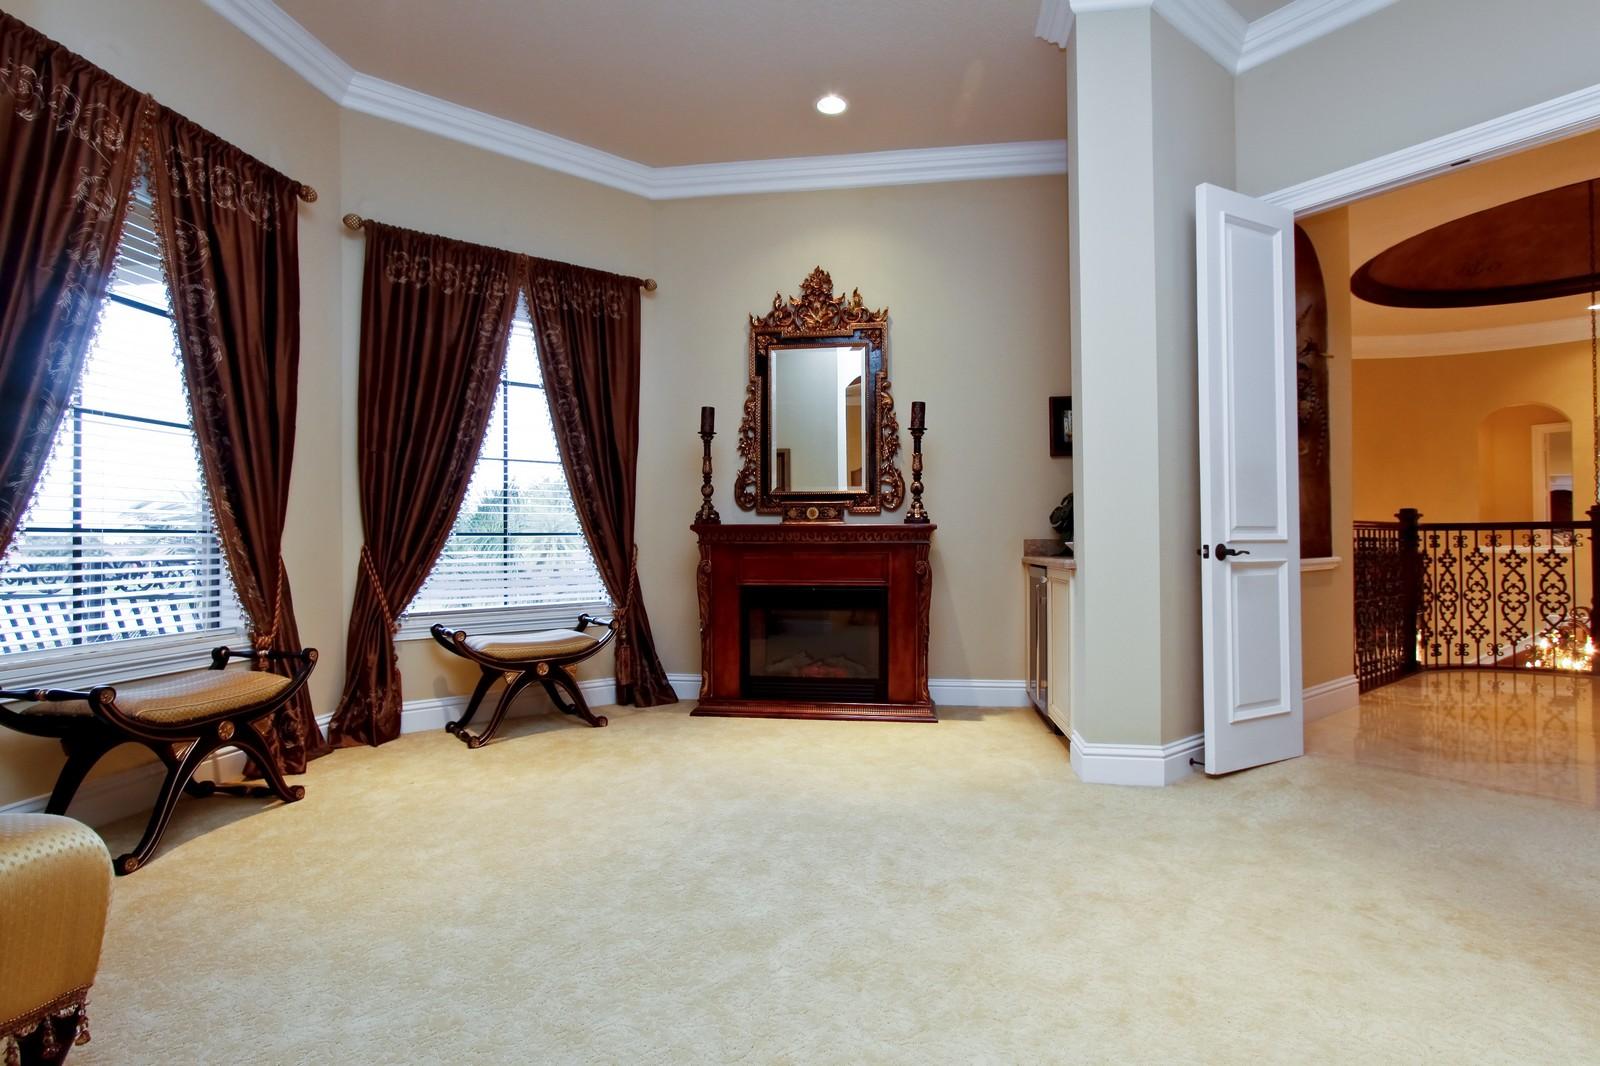 Real Estate Photography - 9391 Bridgebrook Drive, Boca Raton, FL, 33496 - Master Suite Ante Room